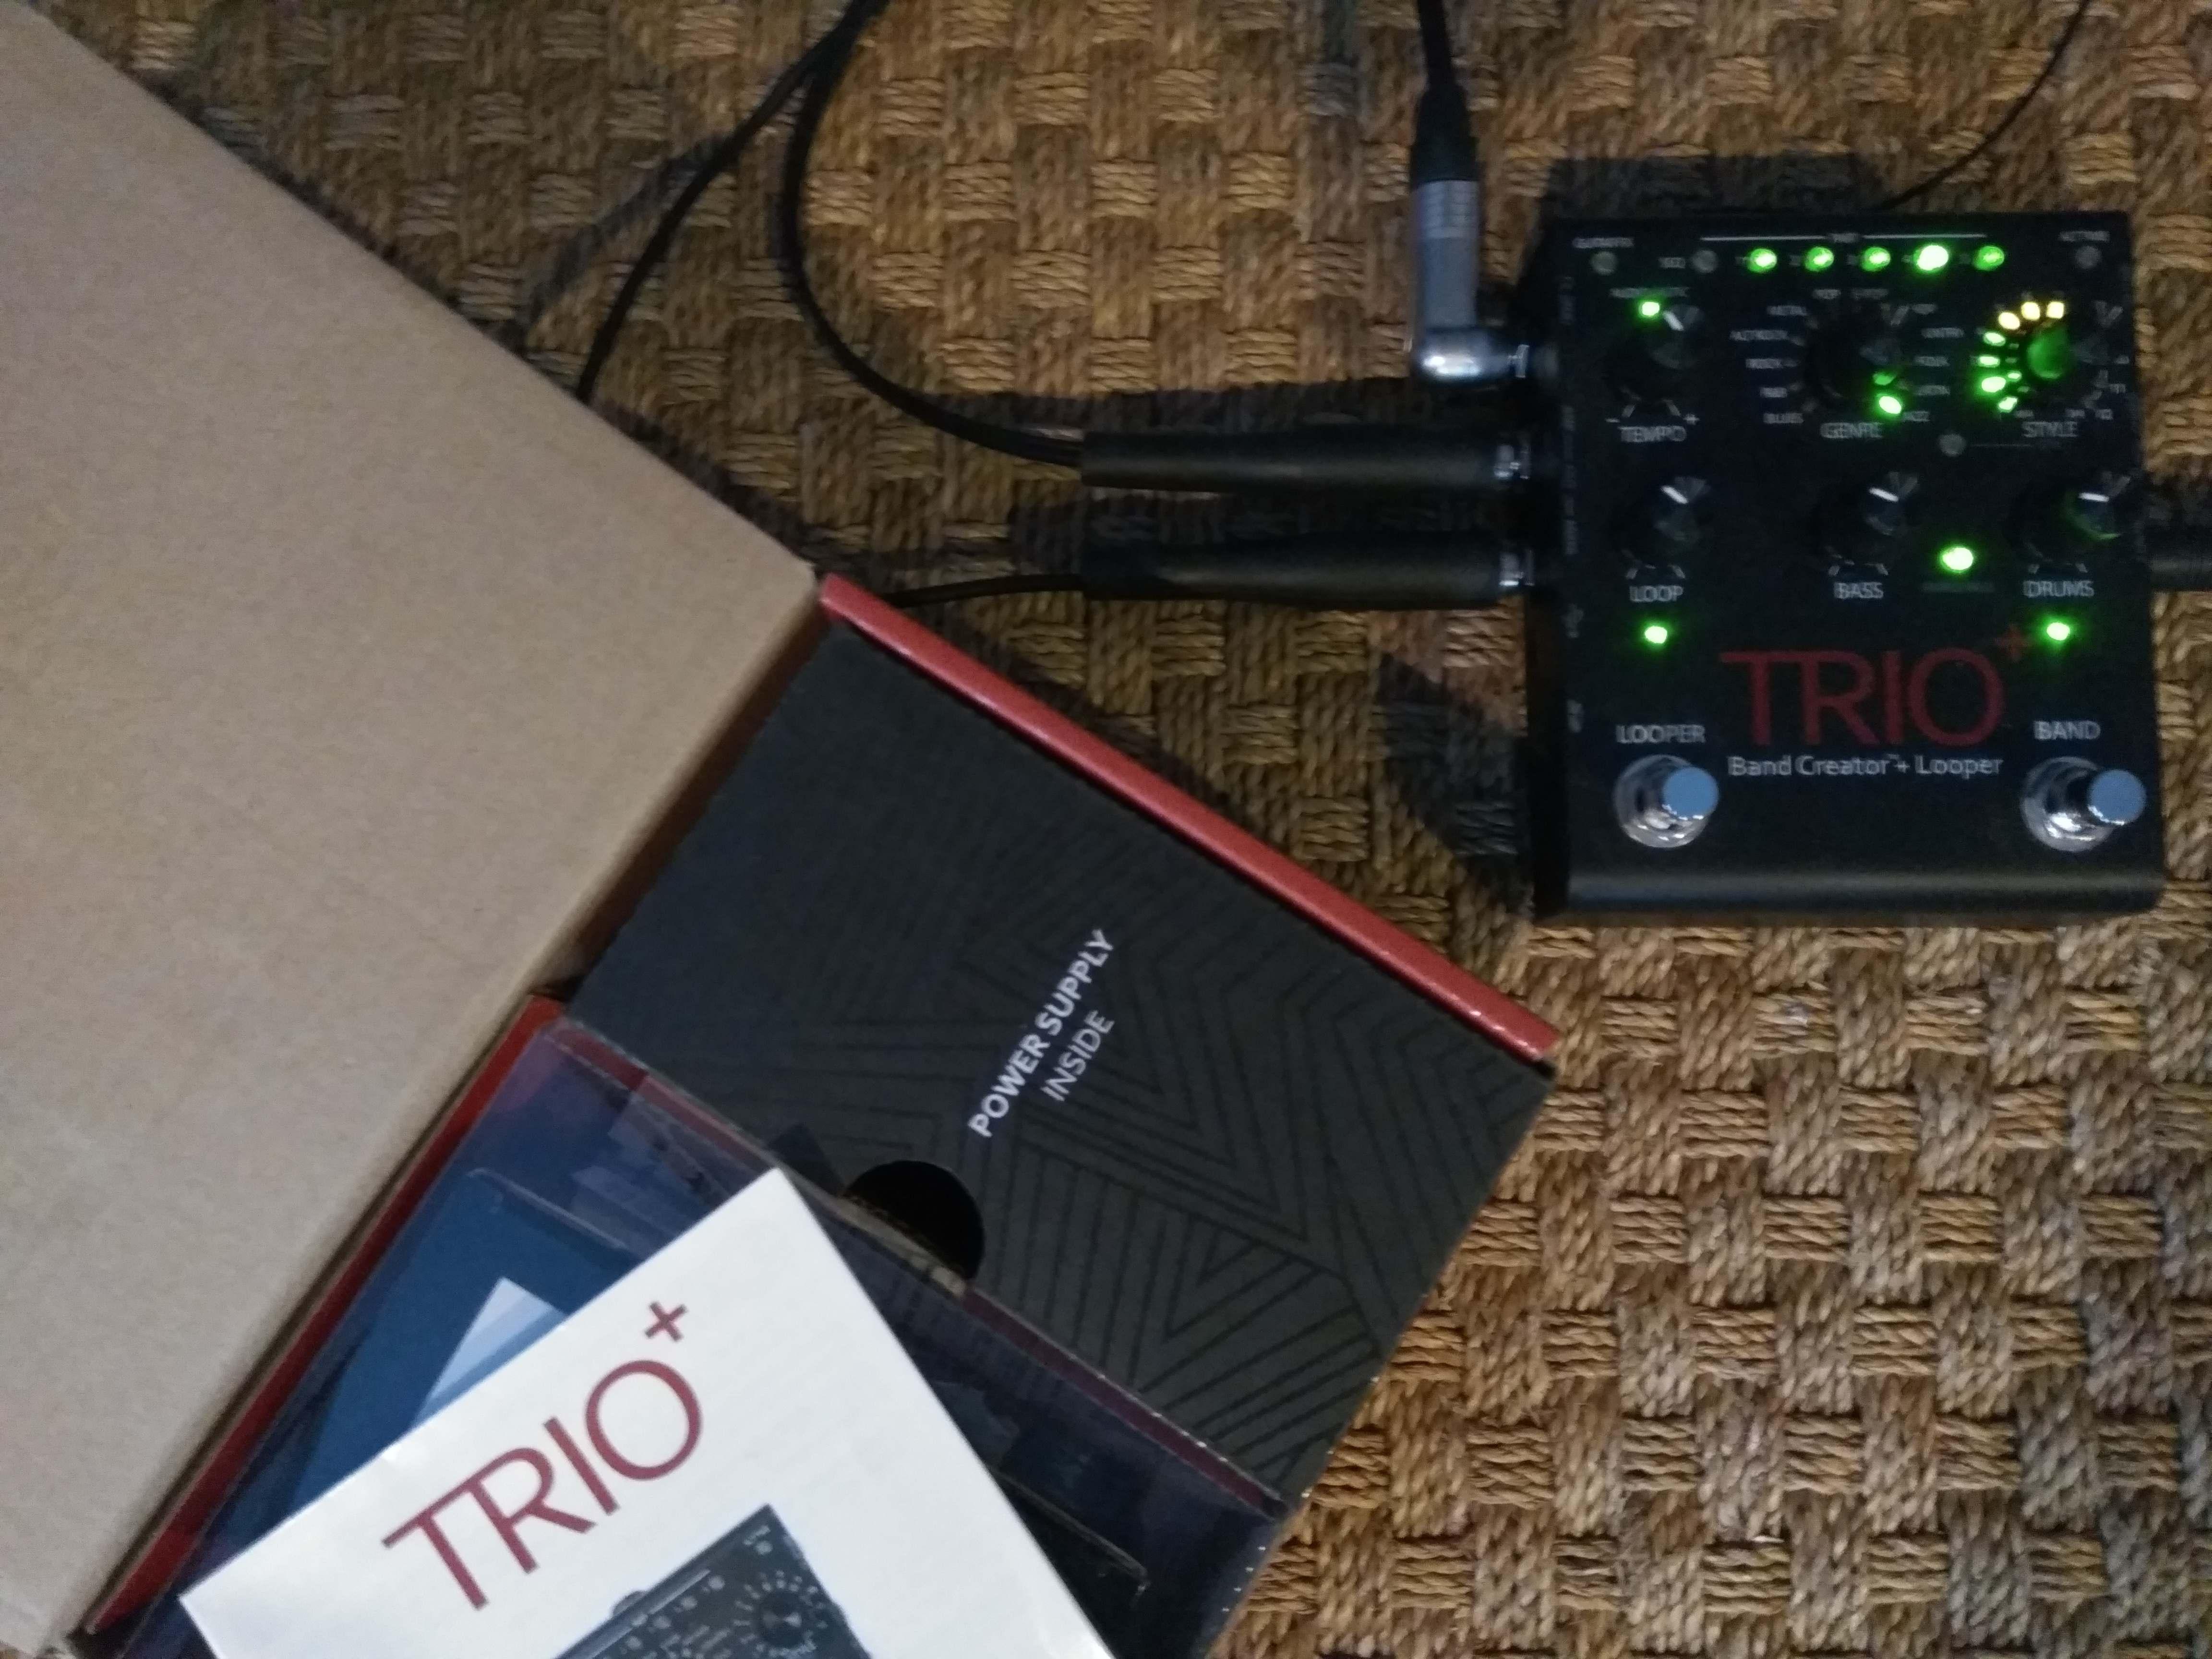 digitech trio band creator manual